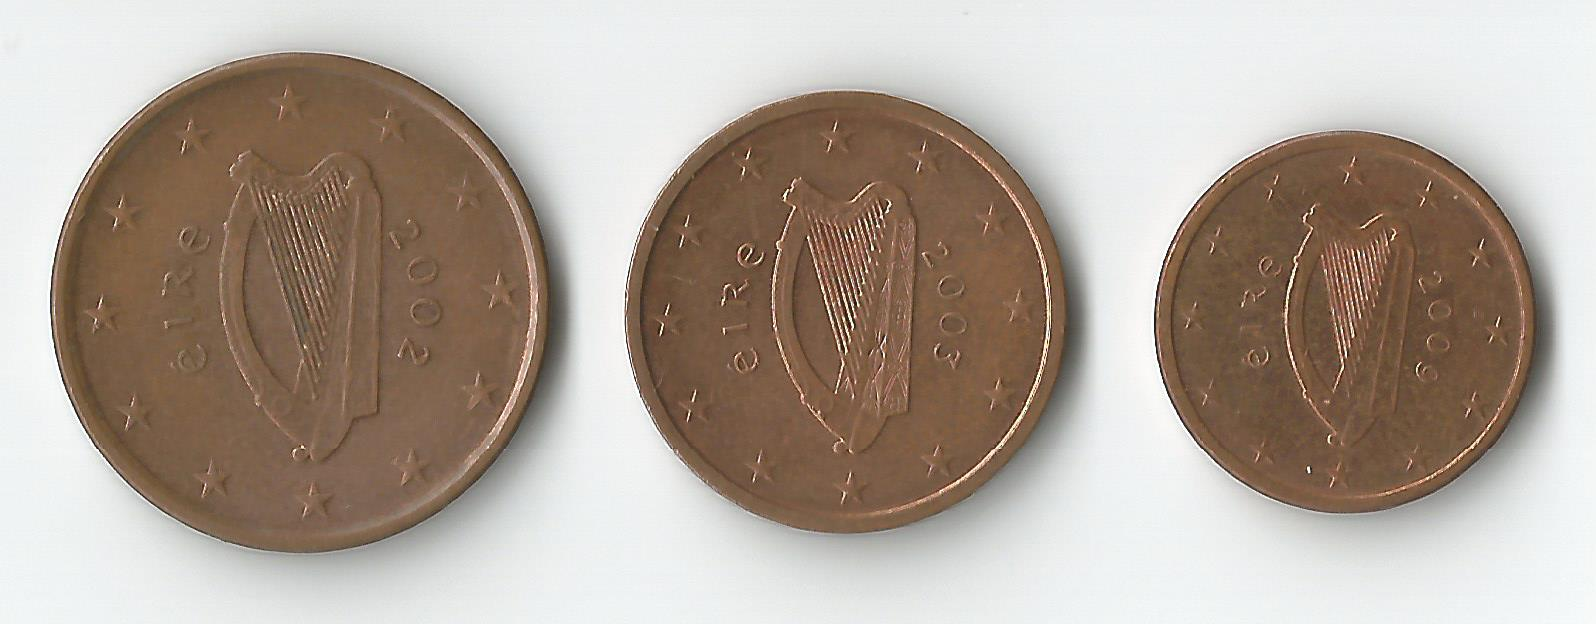 irlanda 5,2,1 cent